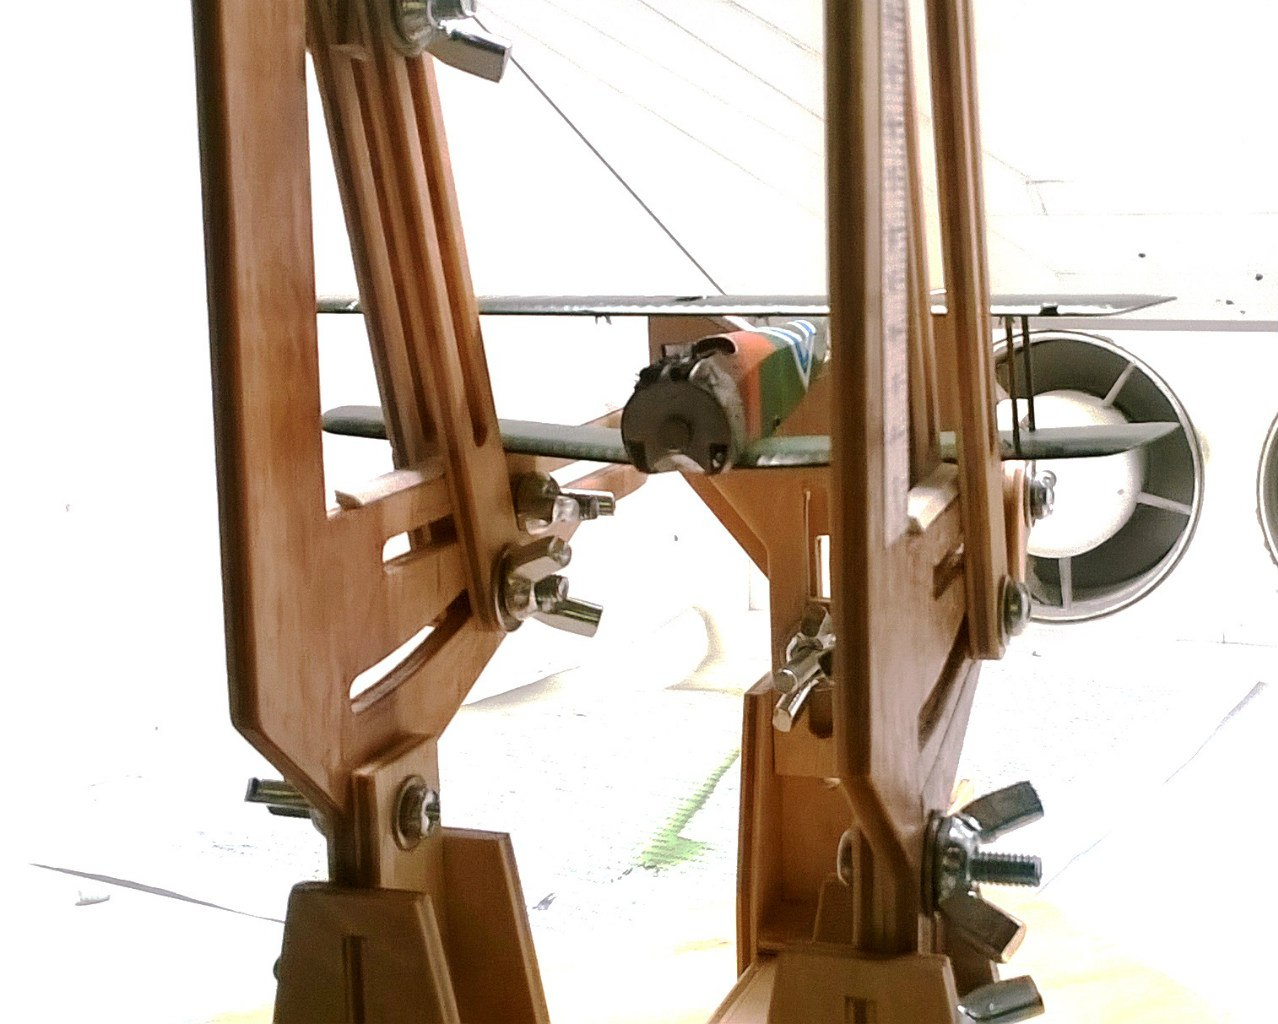 Sopwith F-1 Camel 1/72 (Roden)   - Страница 2 4mPJvk7PLcg